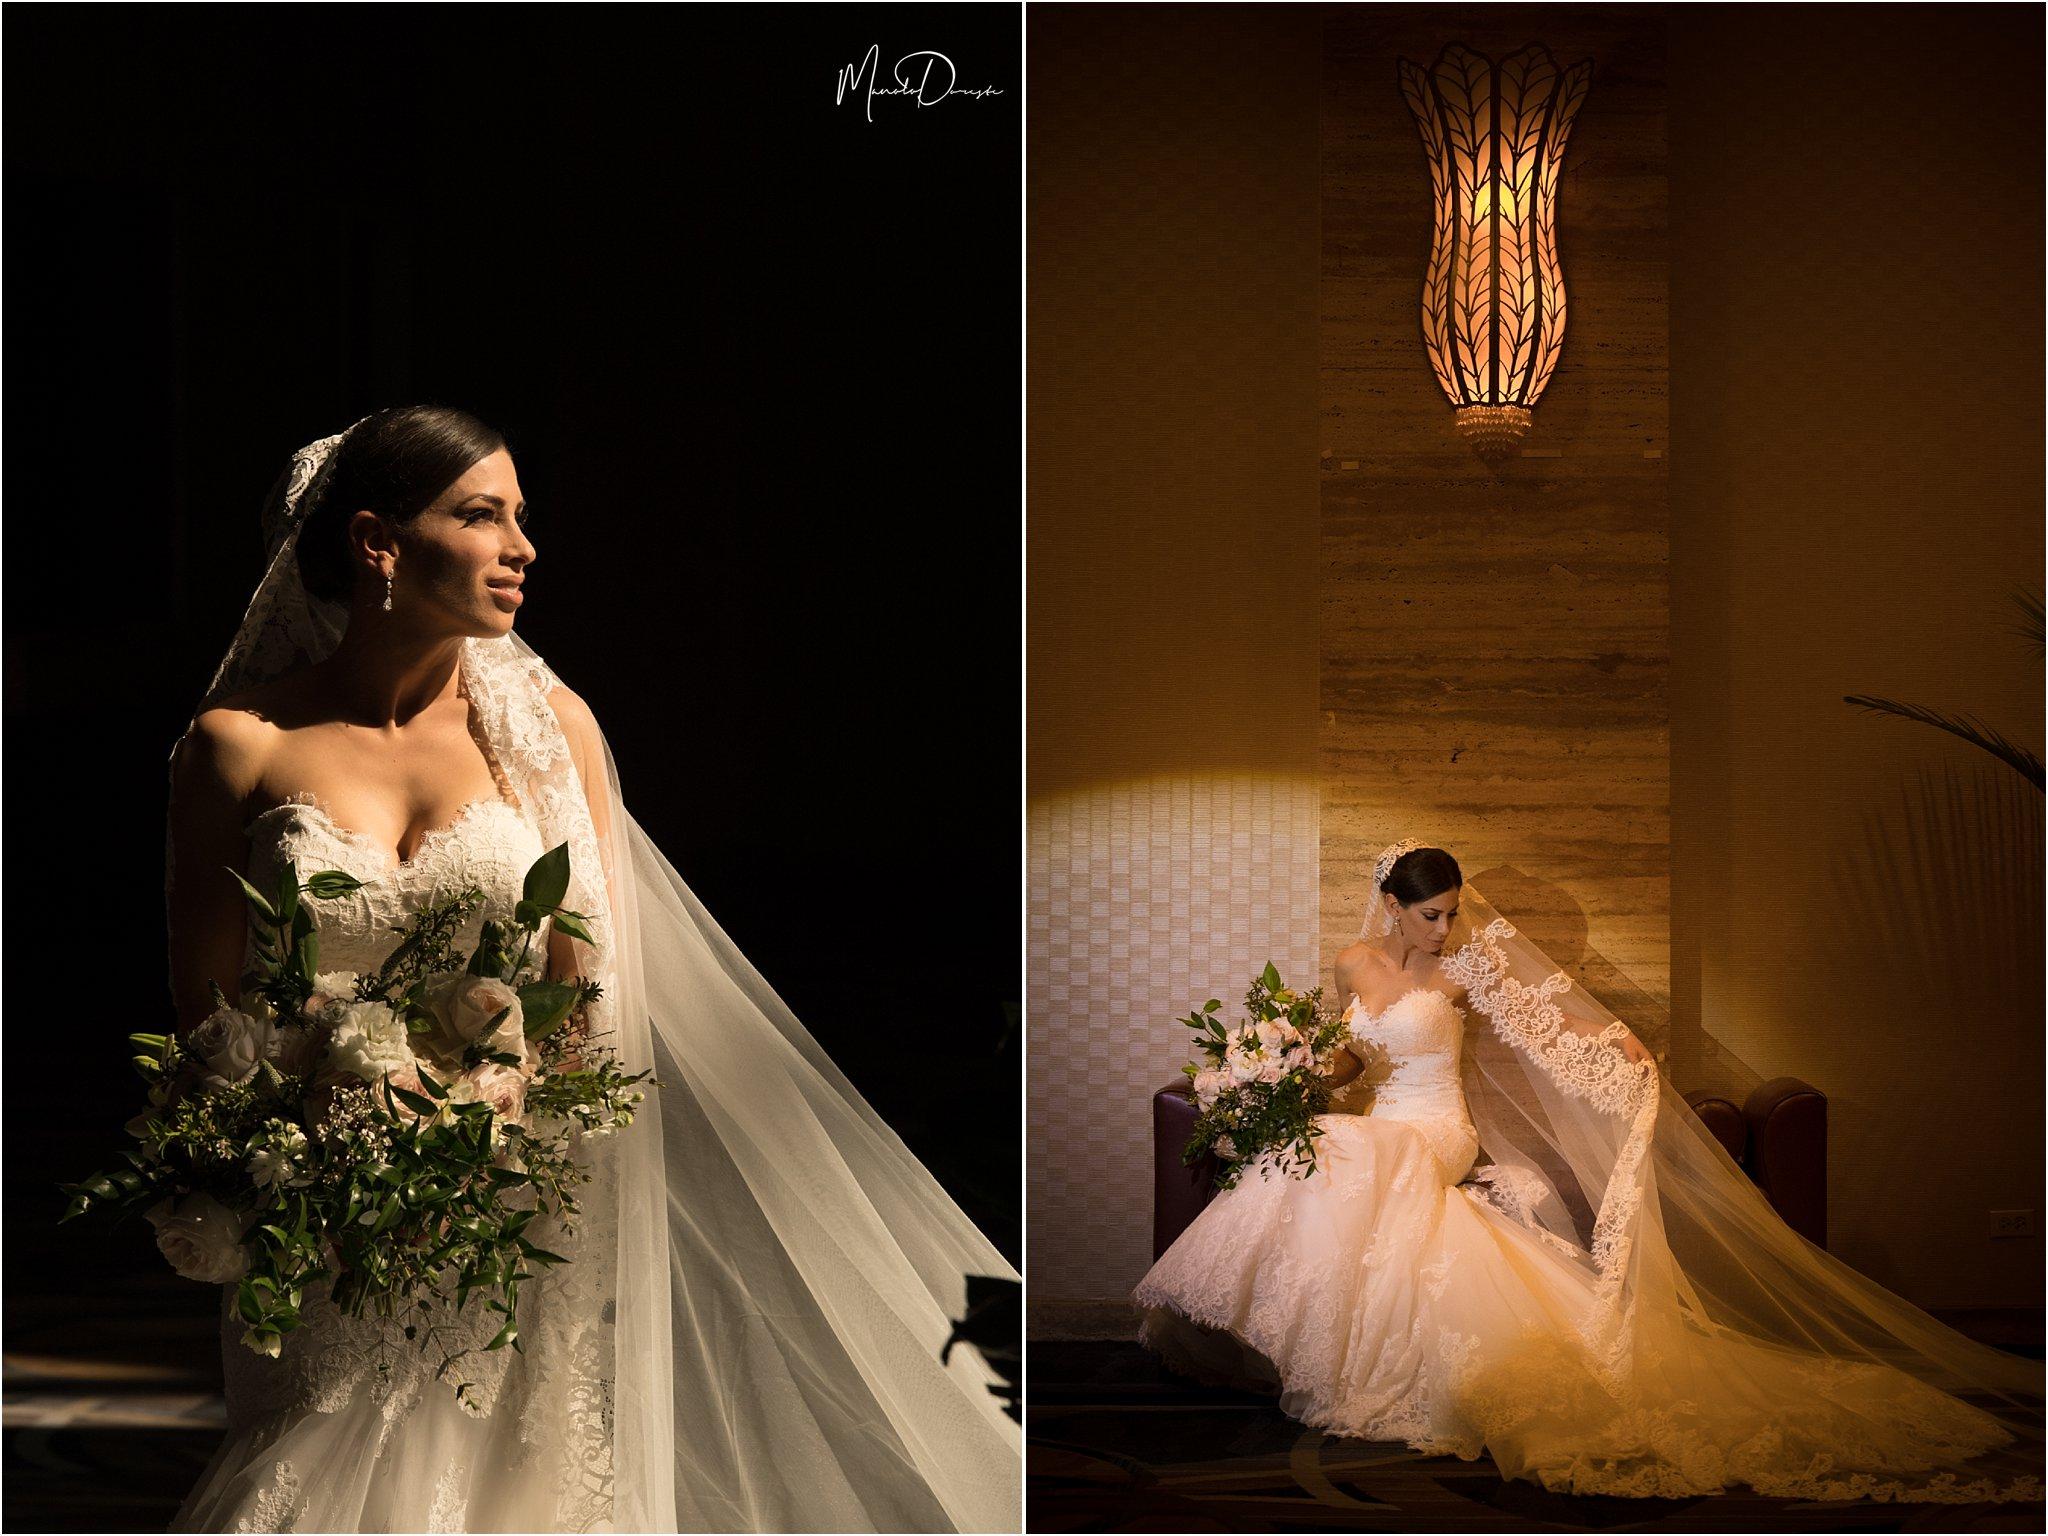 00751_ManoloDoreste_InFocusStudios_Wedding_Family_Photography_Miami_MiamiPhotographer.jpg